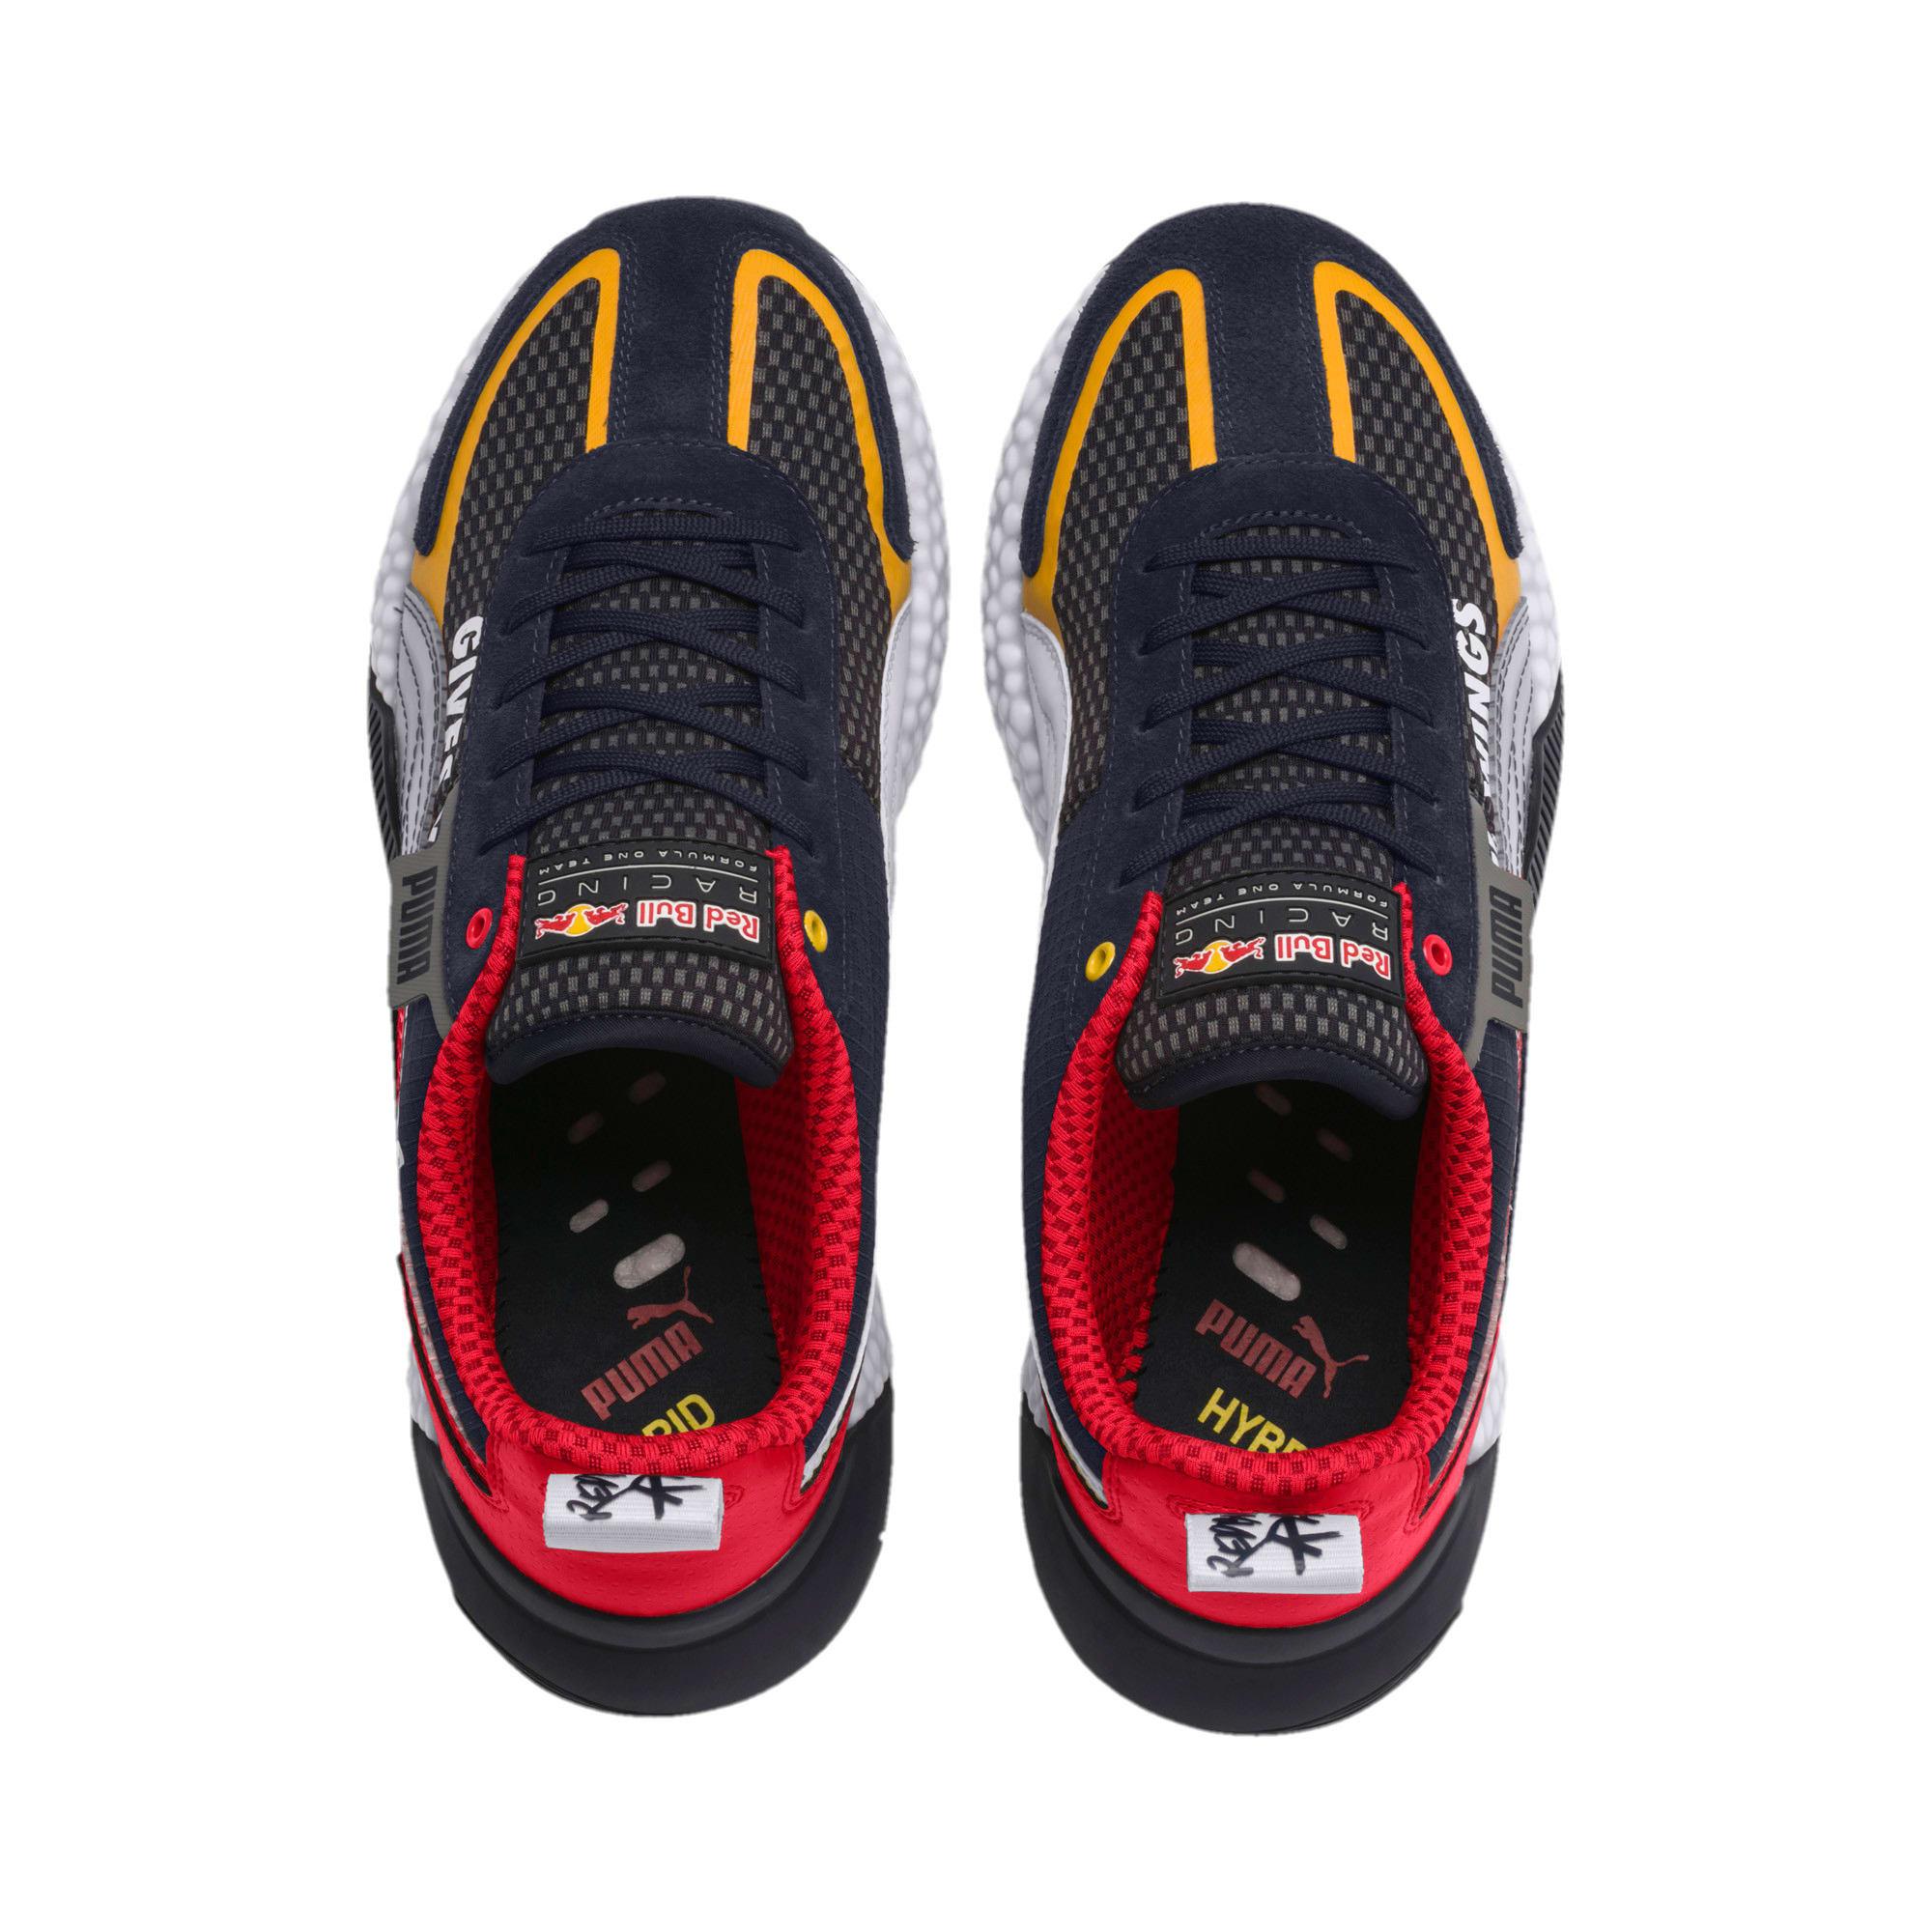 Thumbnail 7 of Red Bull Racing Speed HYBRID sneakers voor heren, NIGHT SKY-White-Chinese Red, medium